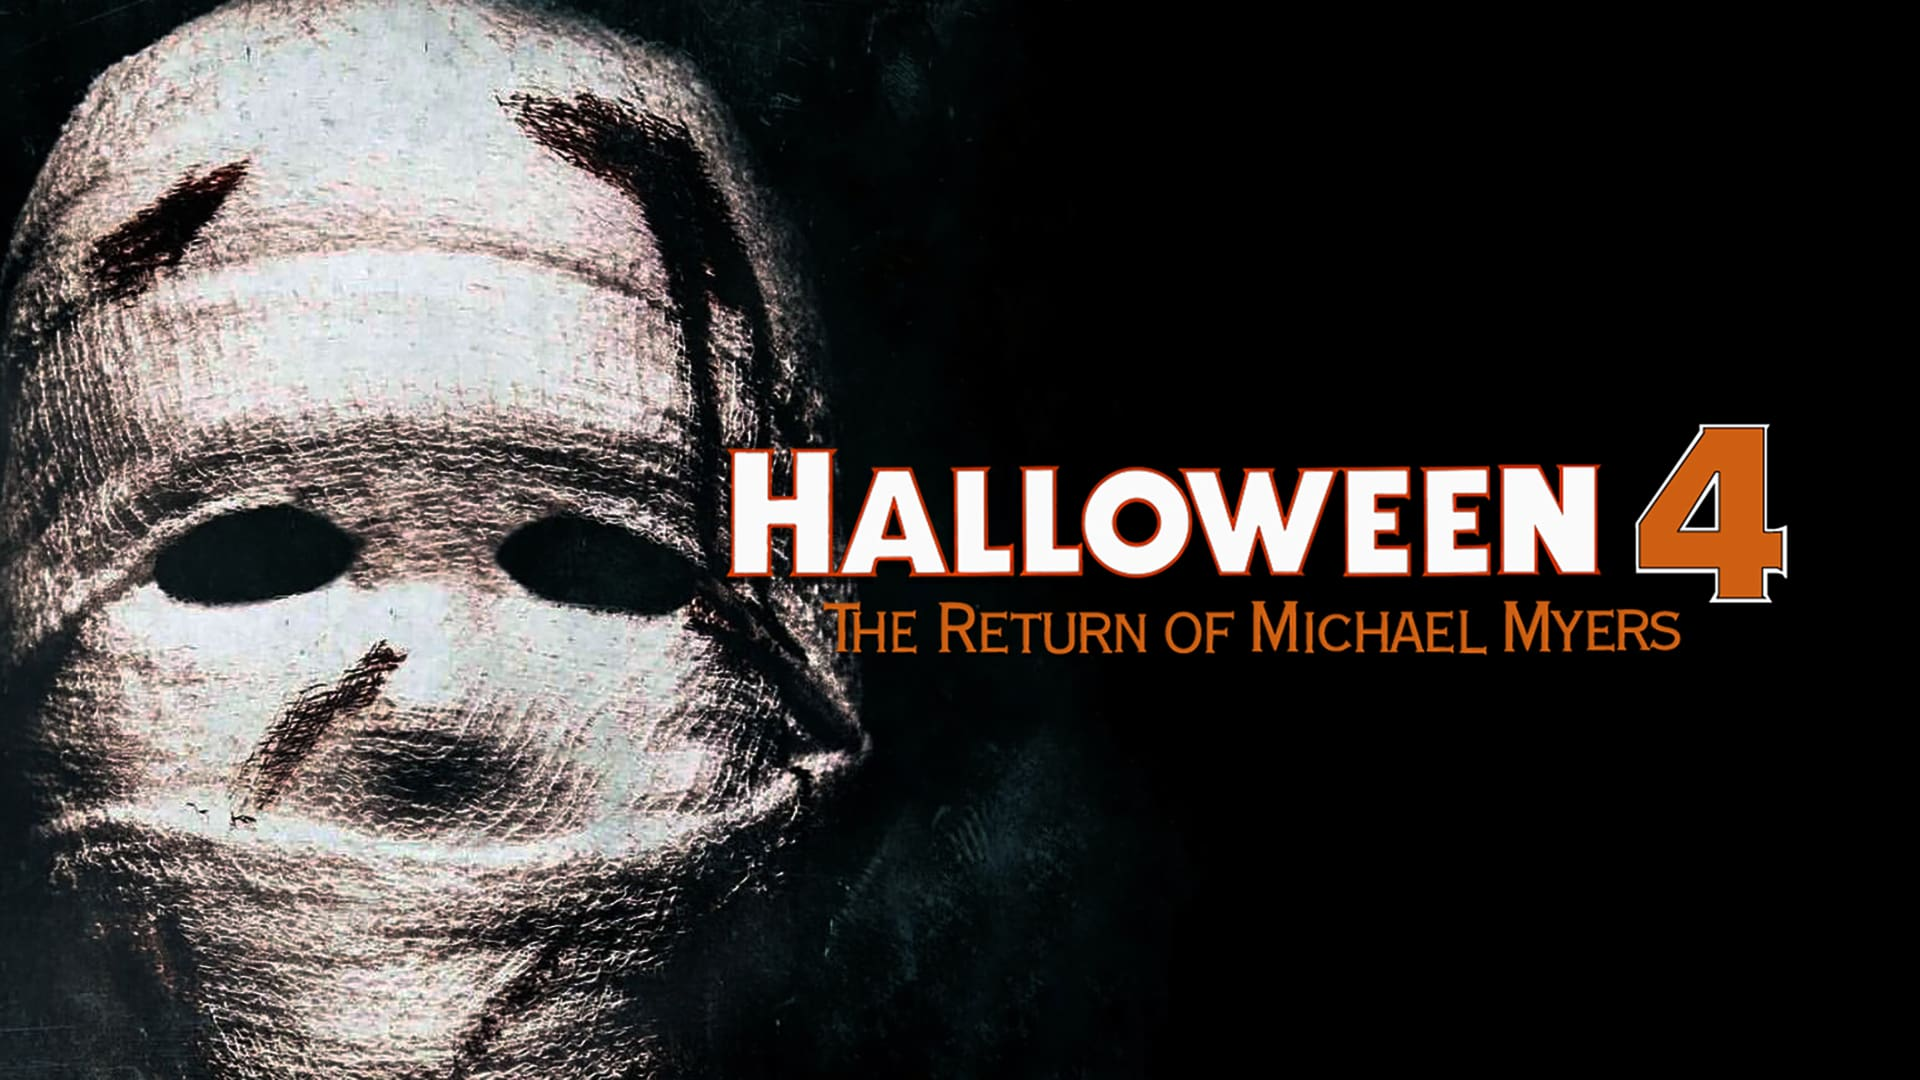 Halloween 4 Streaming Hd.Halloween 4 The Return Of Michael Myers Movie Streaming Online Watch